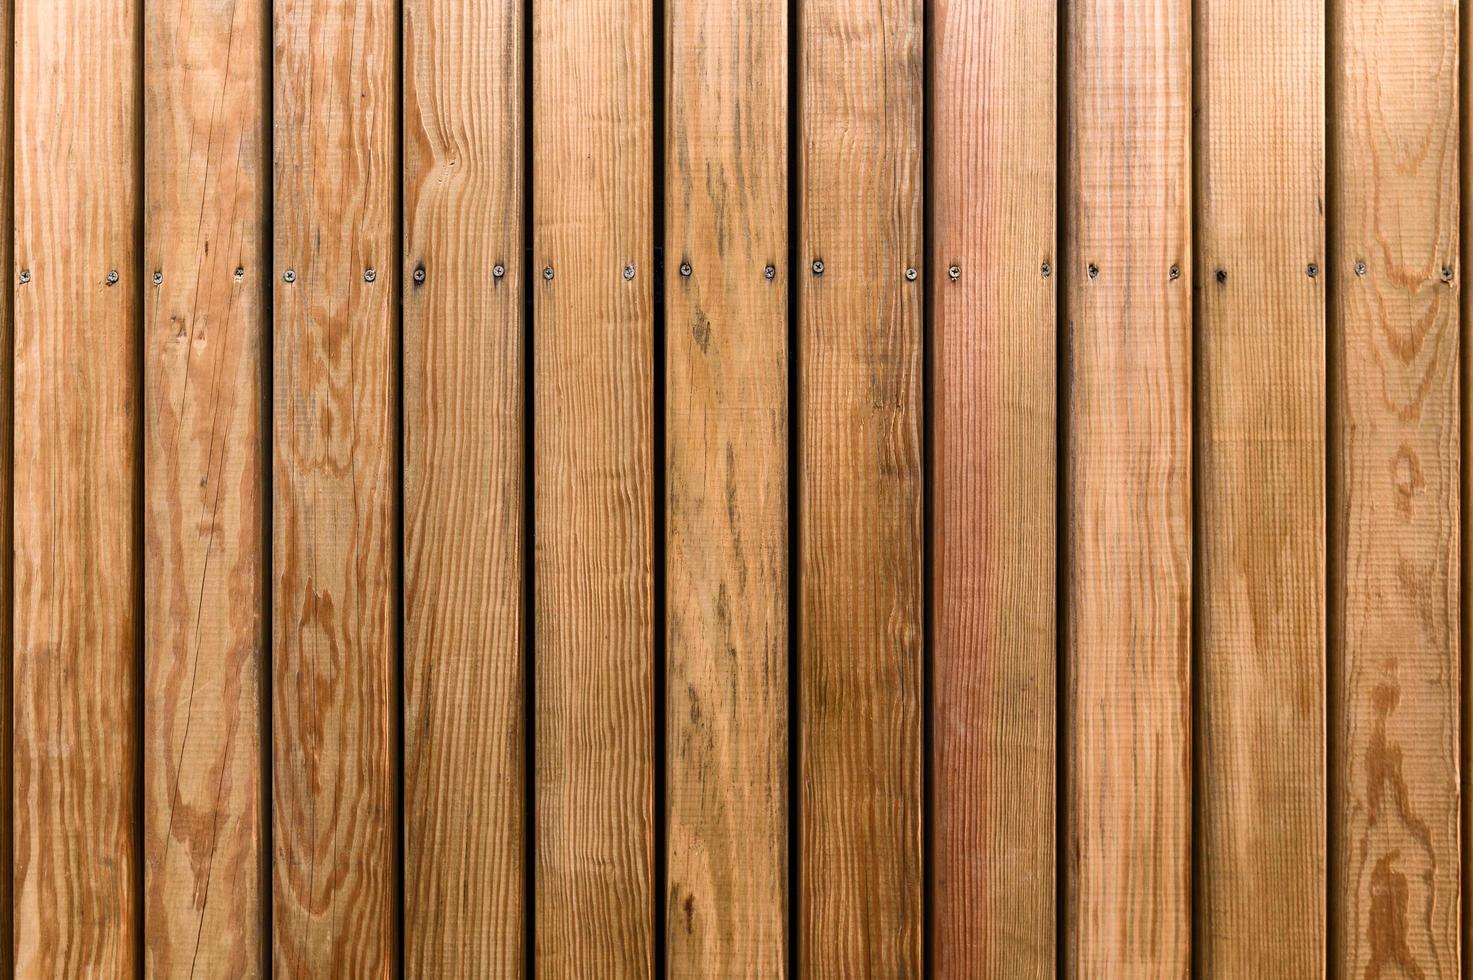 mur de bois de construction vieilli photo